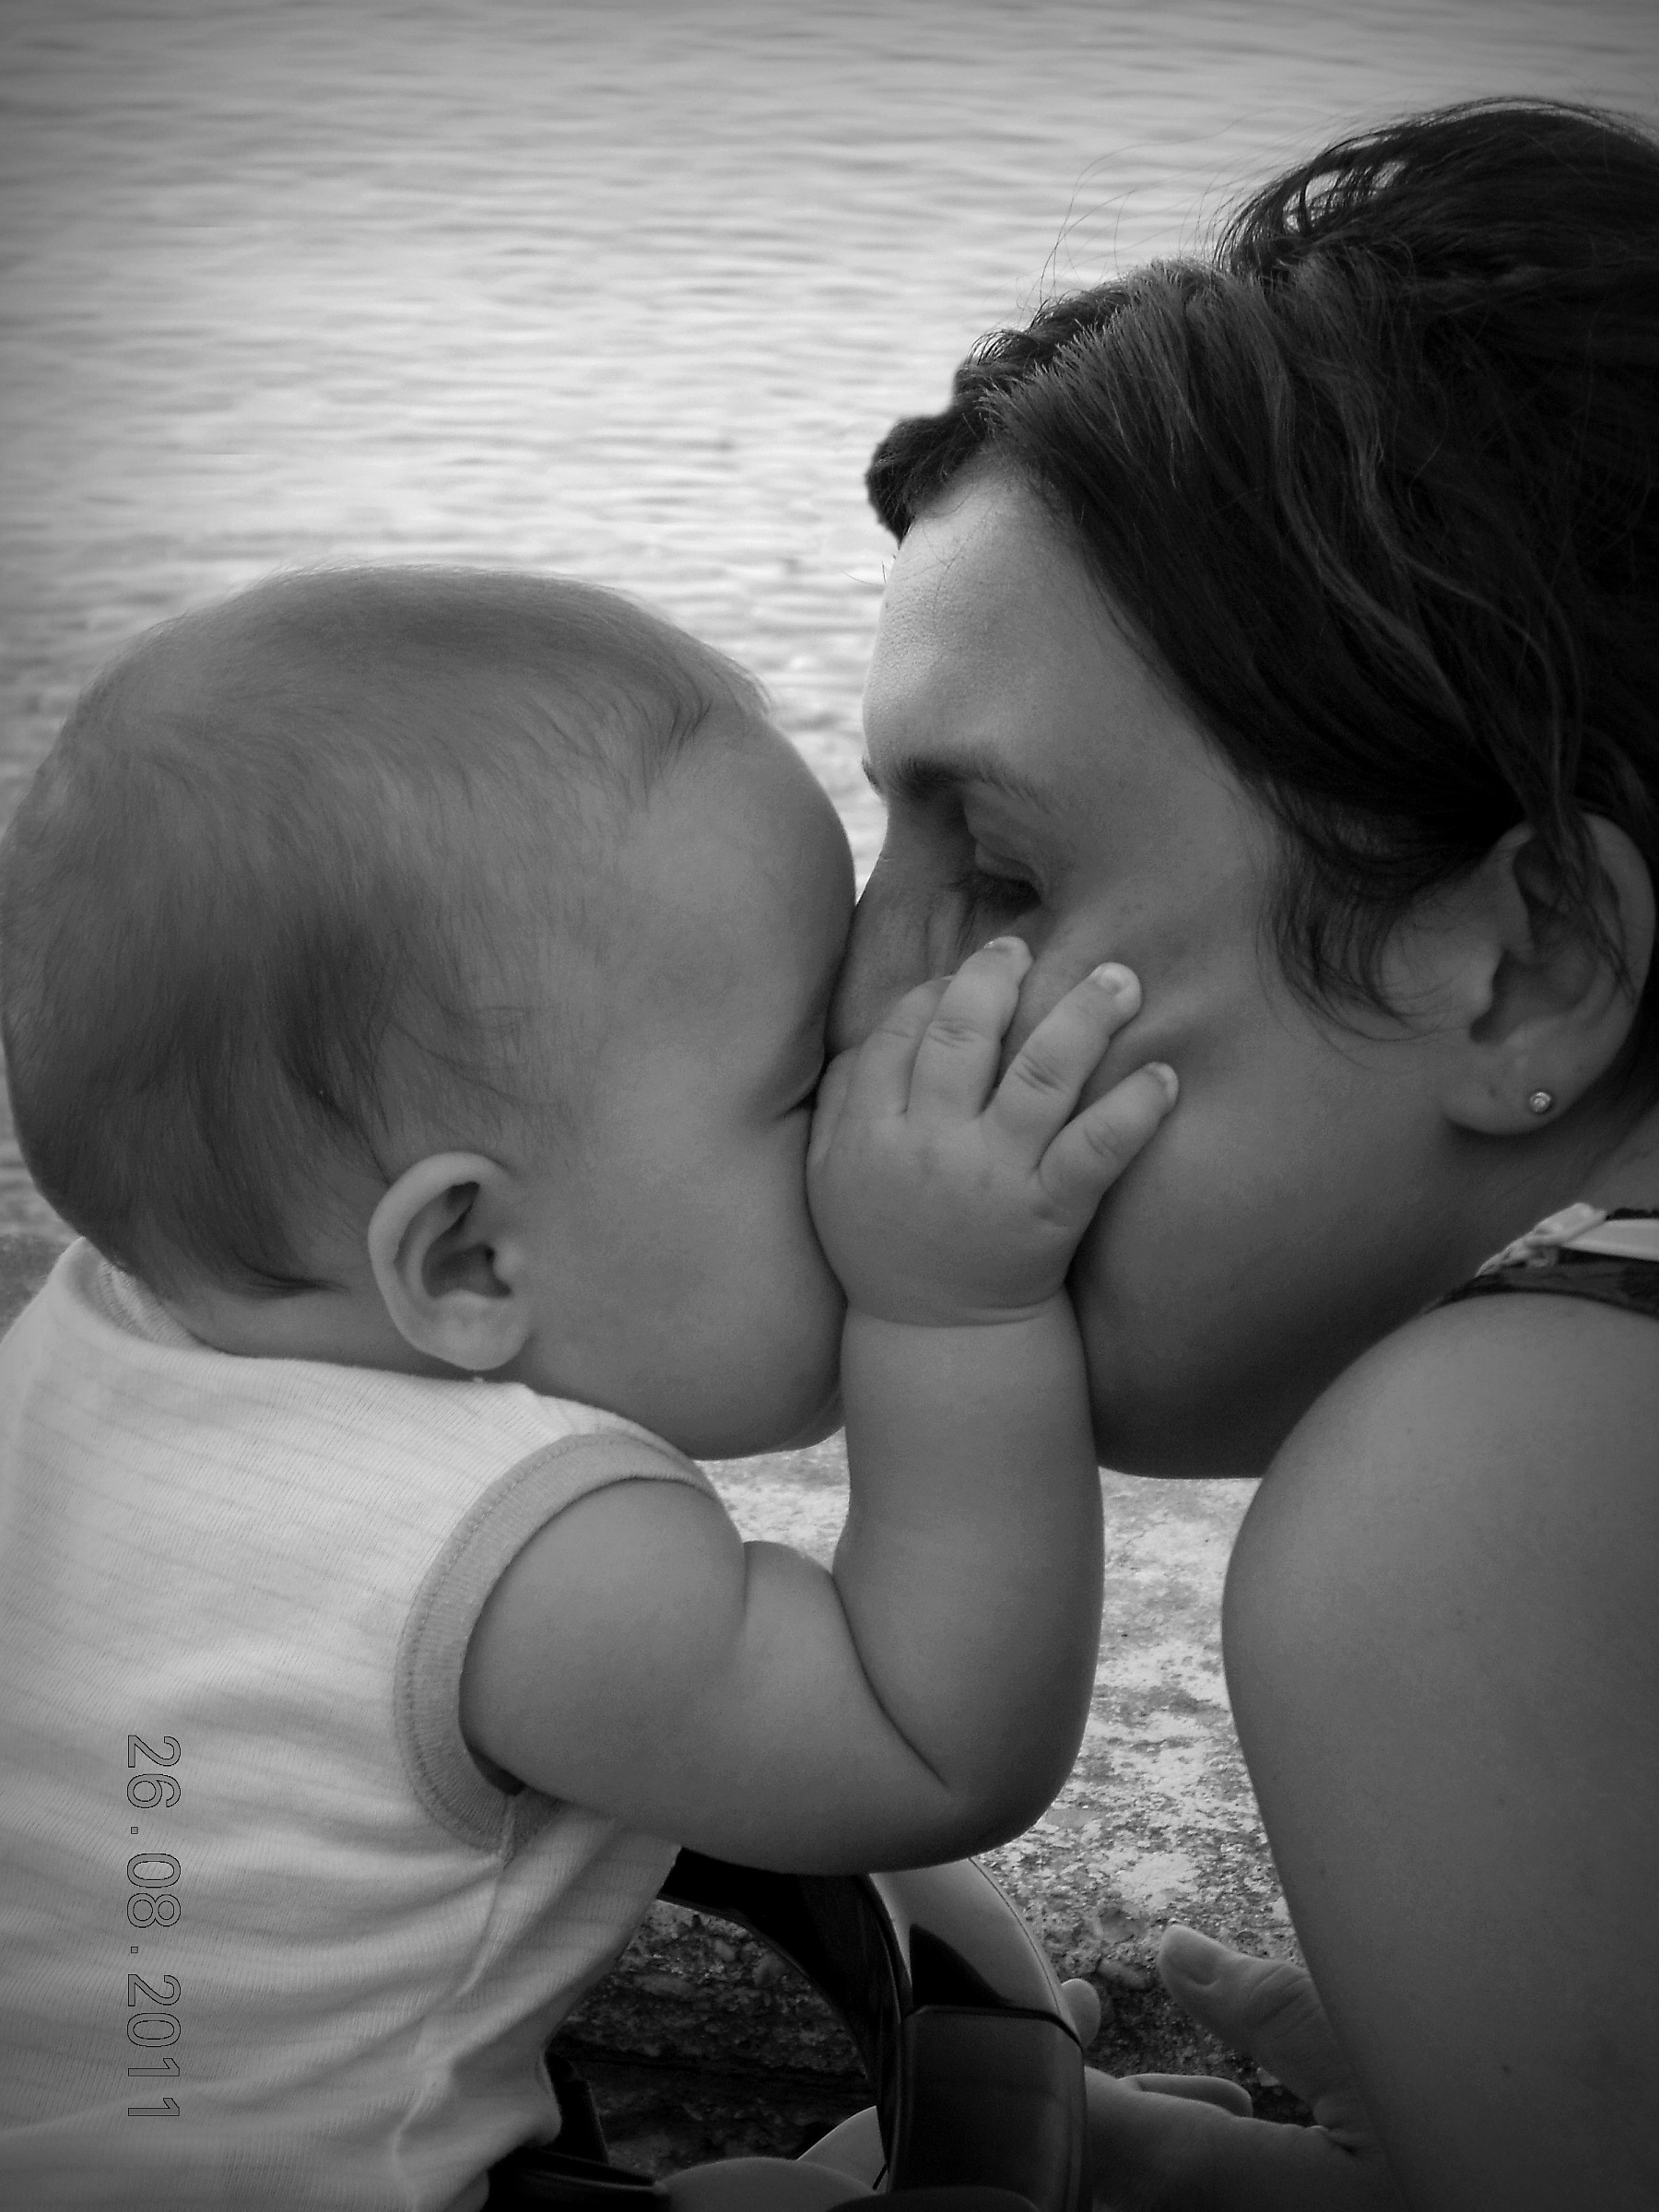 baciami ancora!...